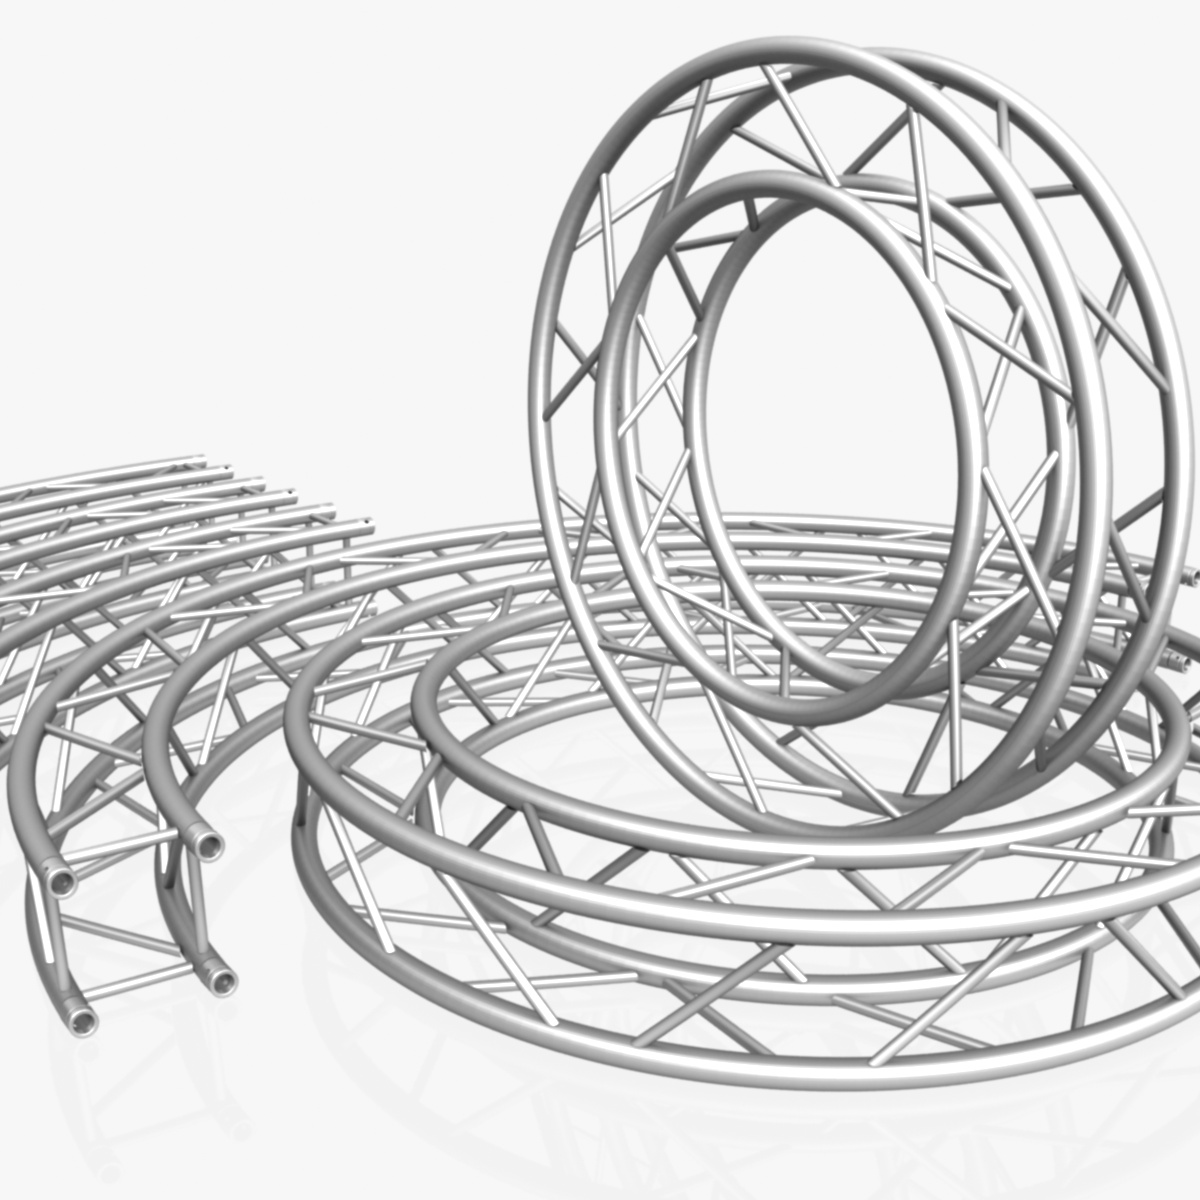 circle square truss modular collection 3d model 3ds max dxf fbx c4d dae  texture obj 252337